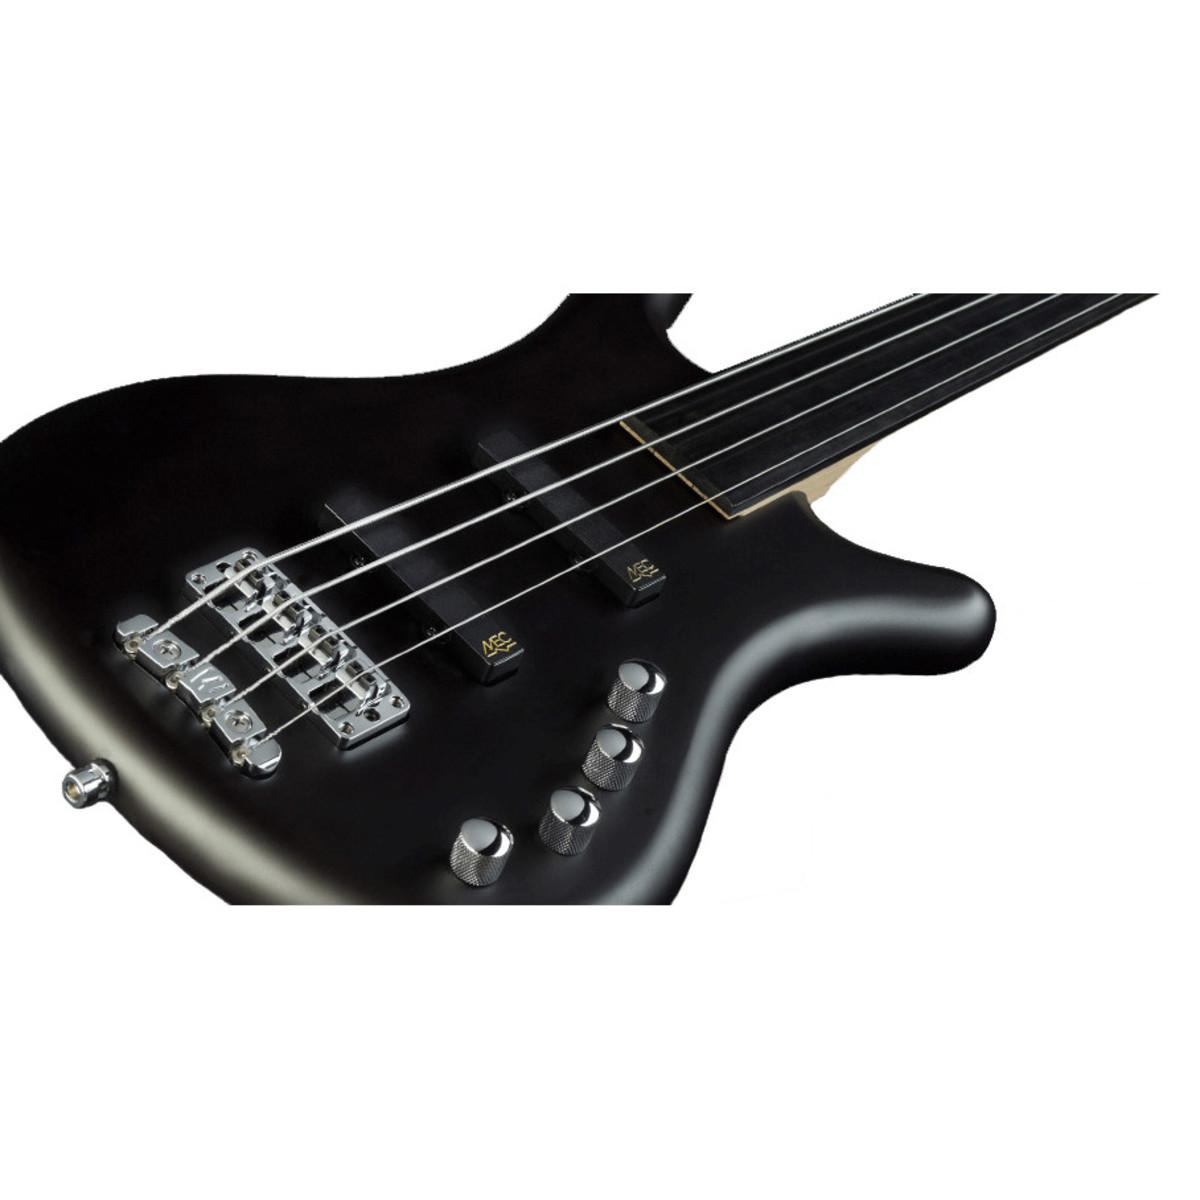 warwick rockbass corvette basic 4 string bass black at. Black Bedroom Furniture Sets. Home Design Ideas